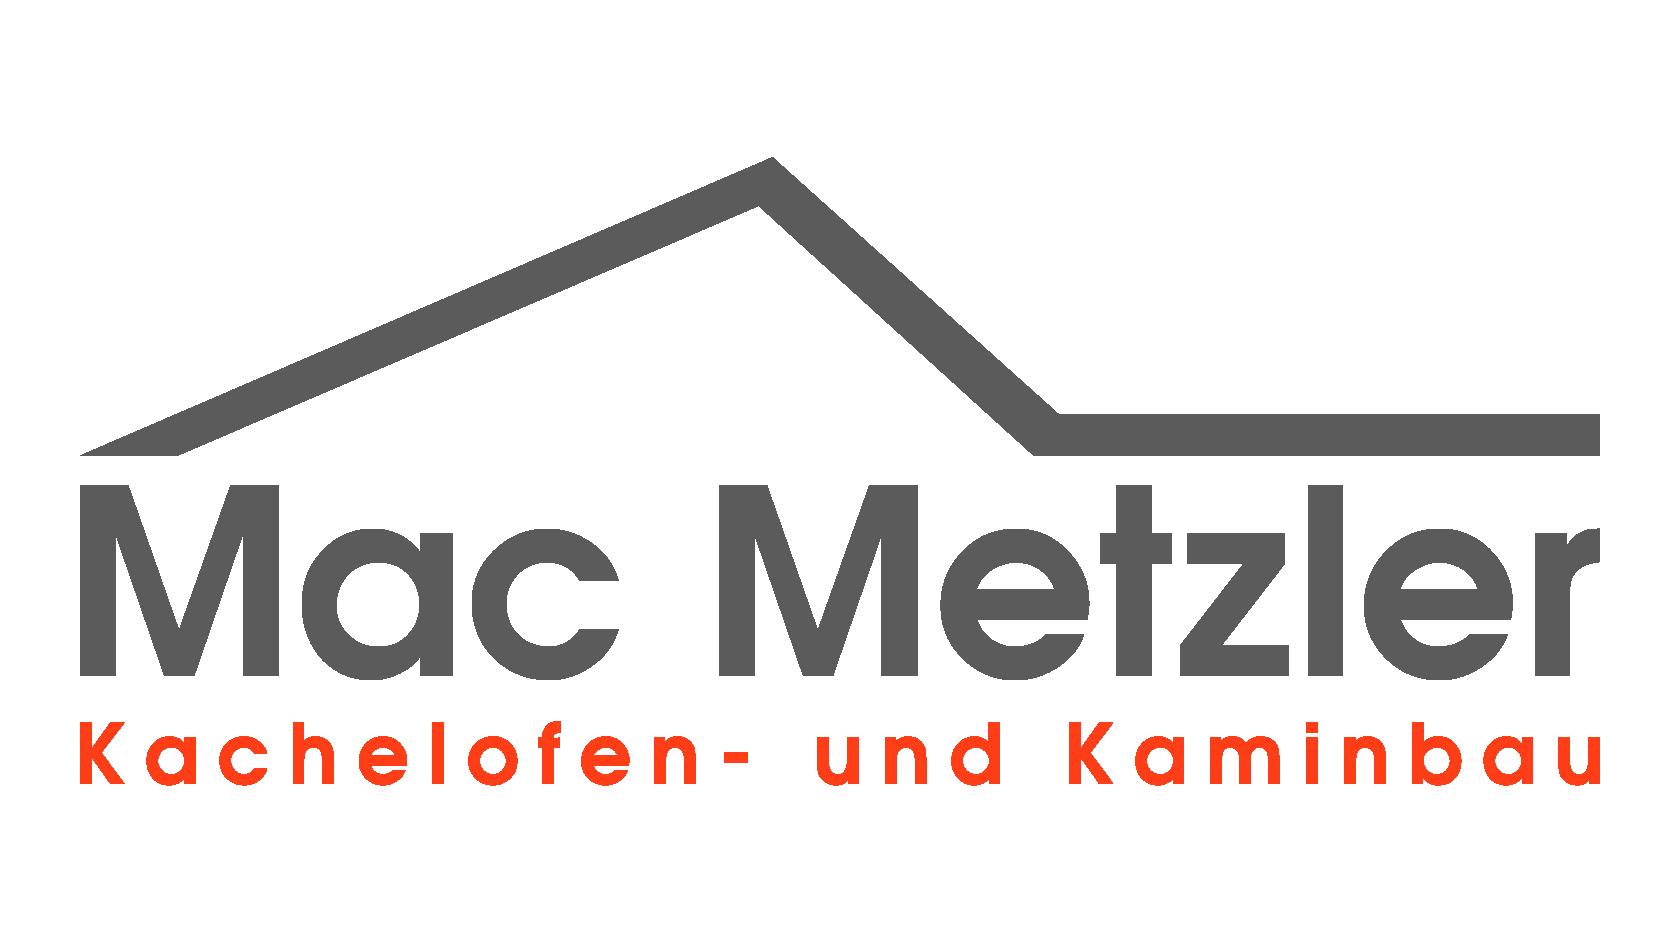 Metzler Energietechnik - Kachelofen und Kamainbau